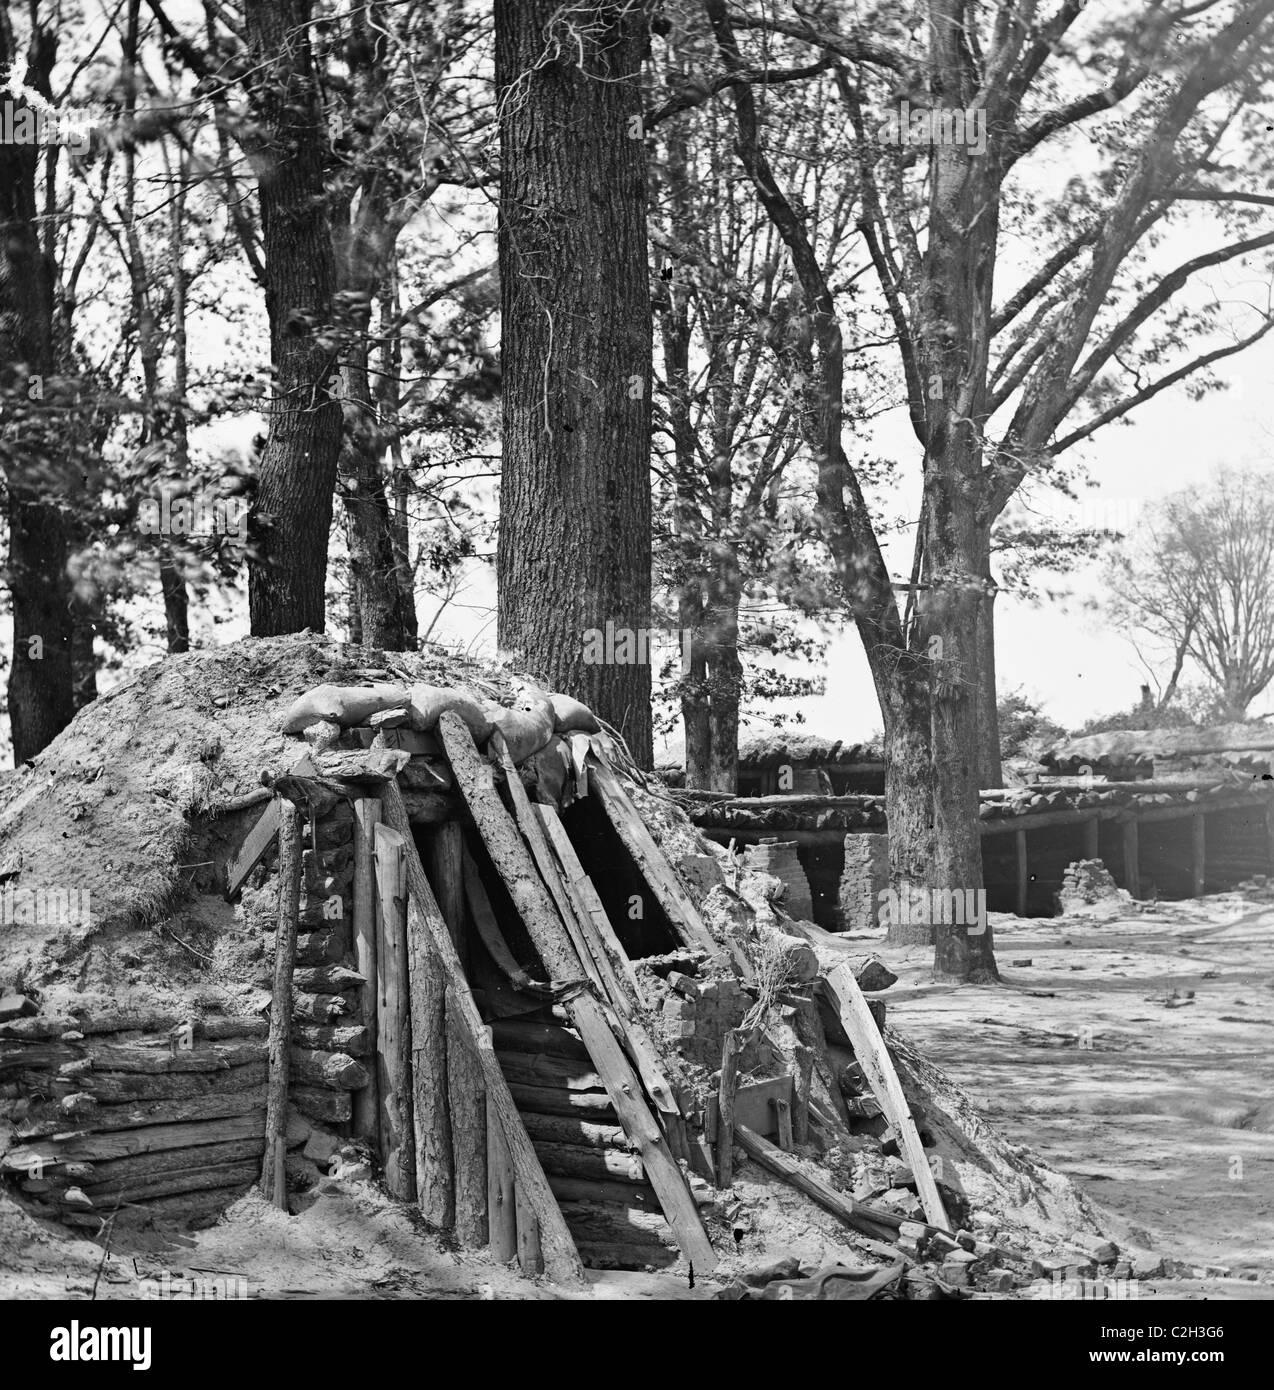 Petersburg, Va. Interior of Fort Steadman; bomb-proof in foreground - Stock Image